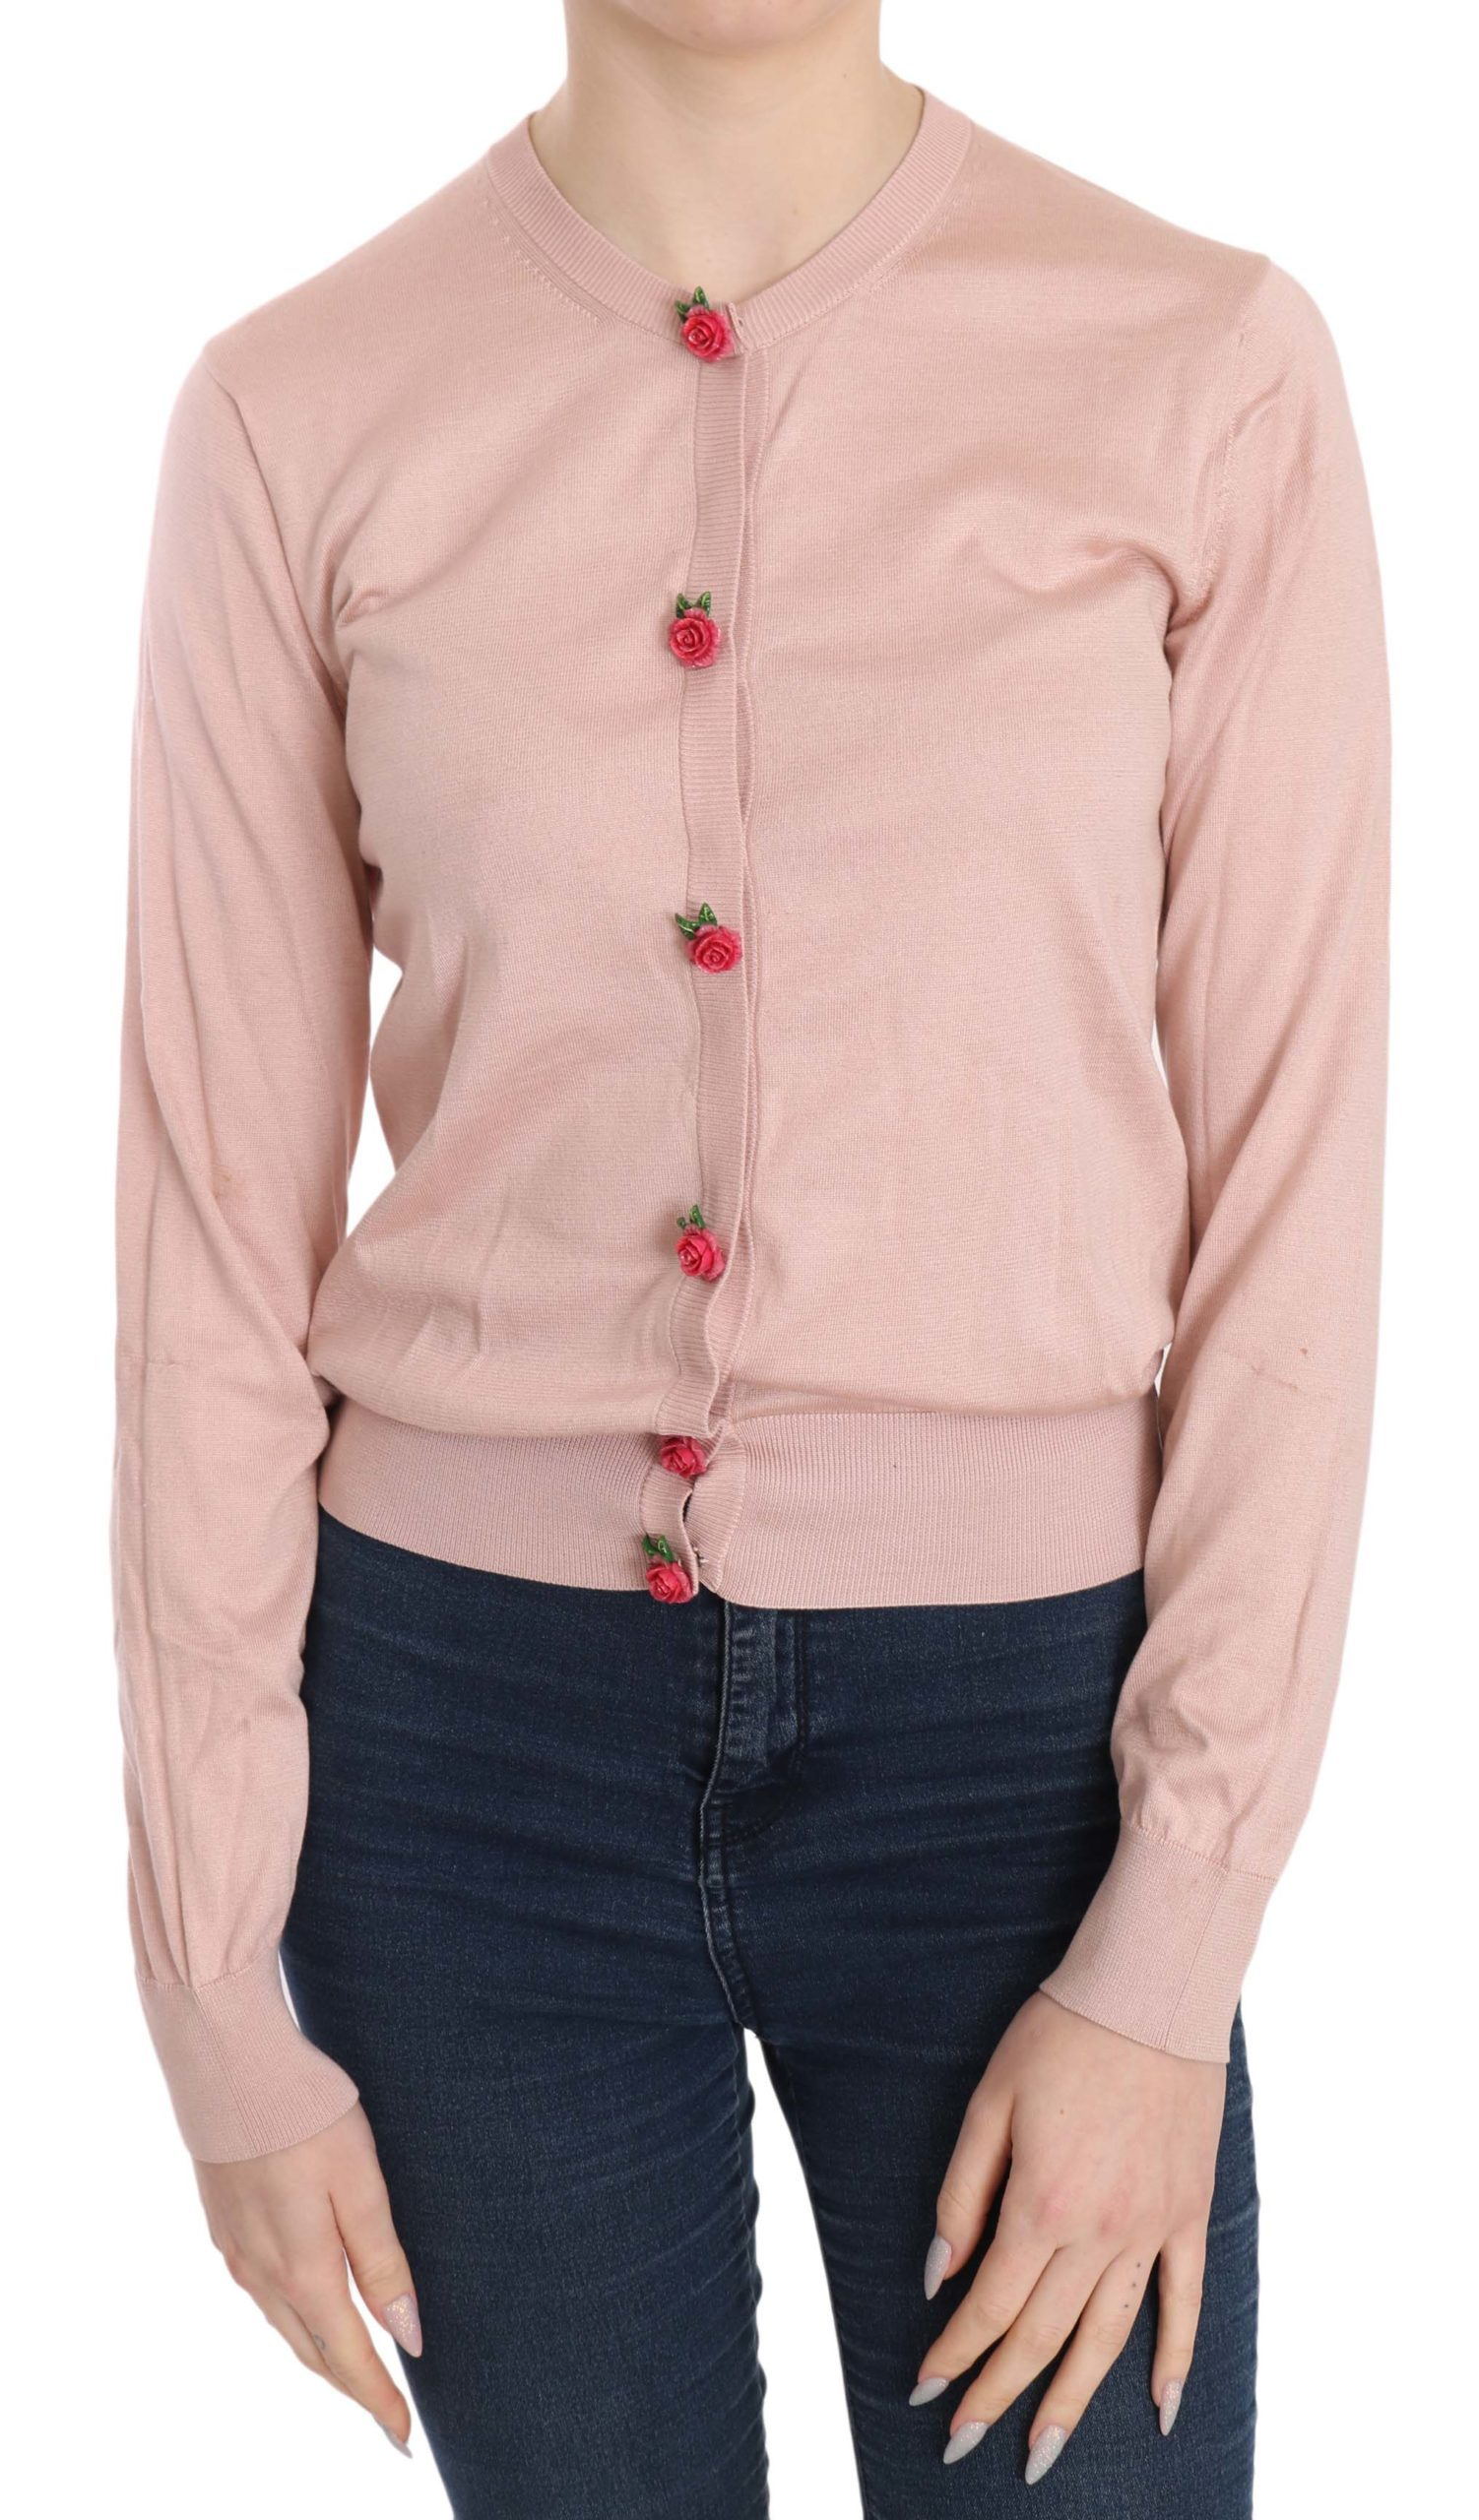 Dolce & Gabbana Women's Roses Silk Cardigan Pink TSH3646 - IT42 M